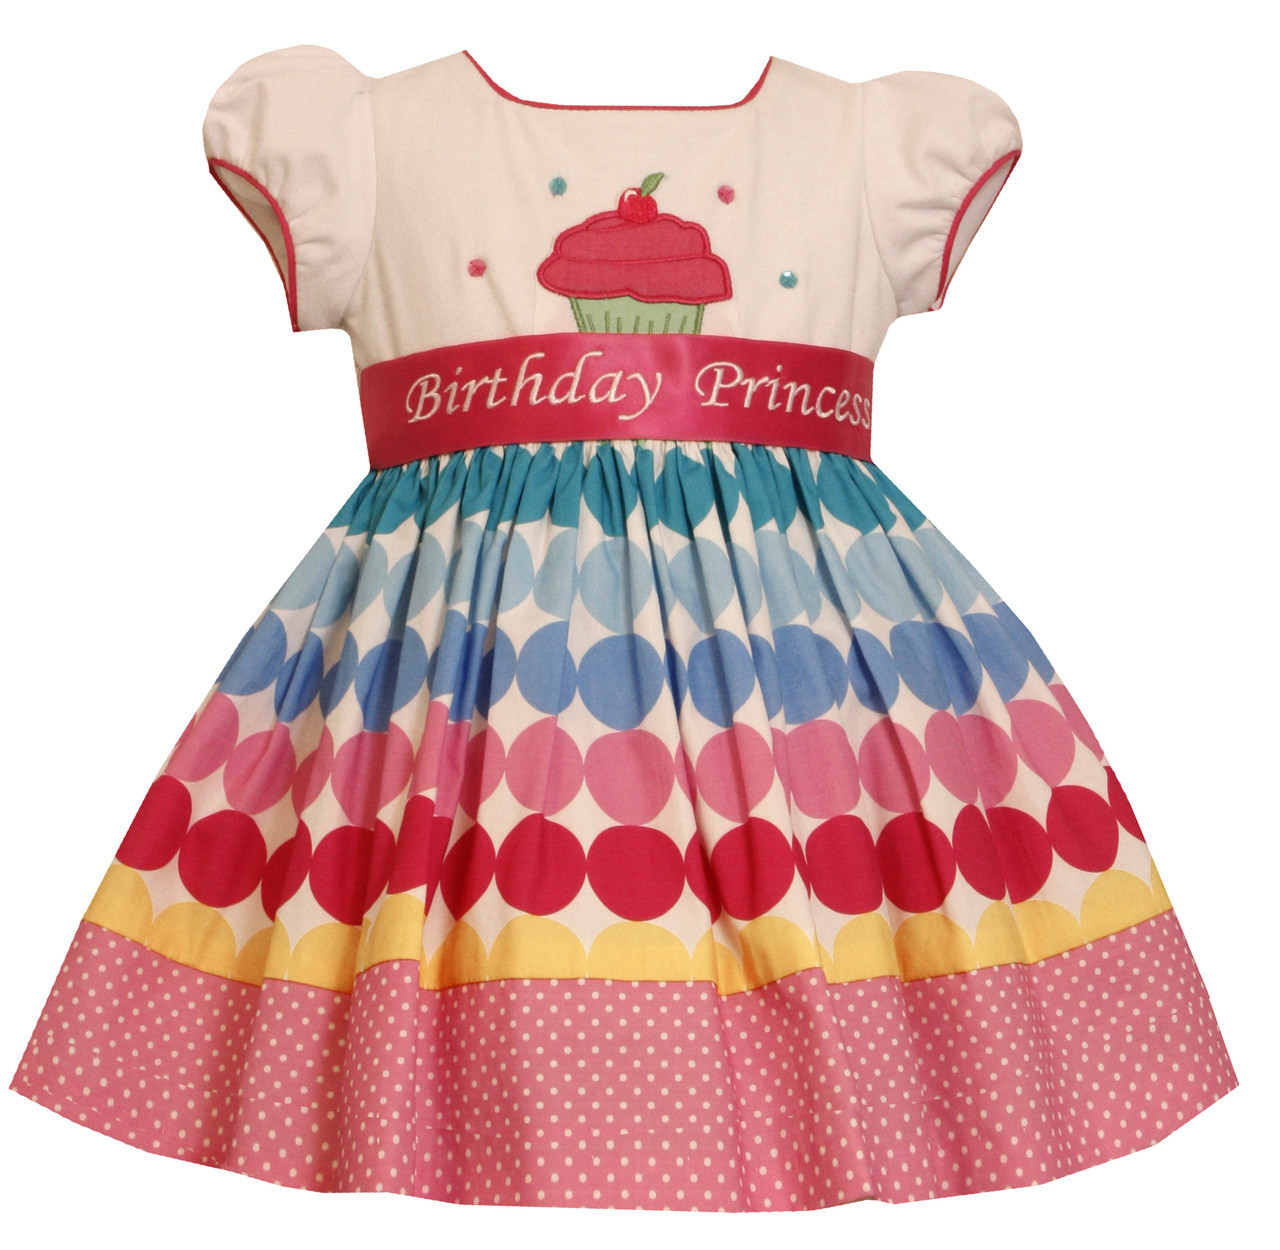 66b1154c4 Bonnie Jean Girls Princess Polka Dot Cupcake Birthday Dress 12 18 24 ...